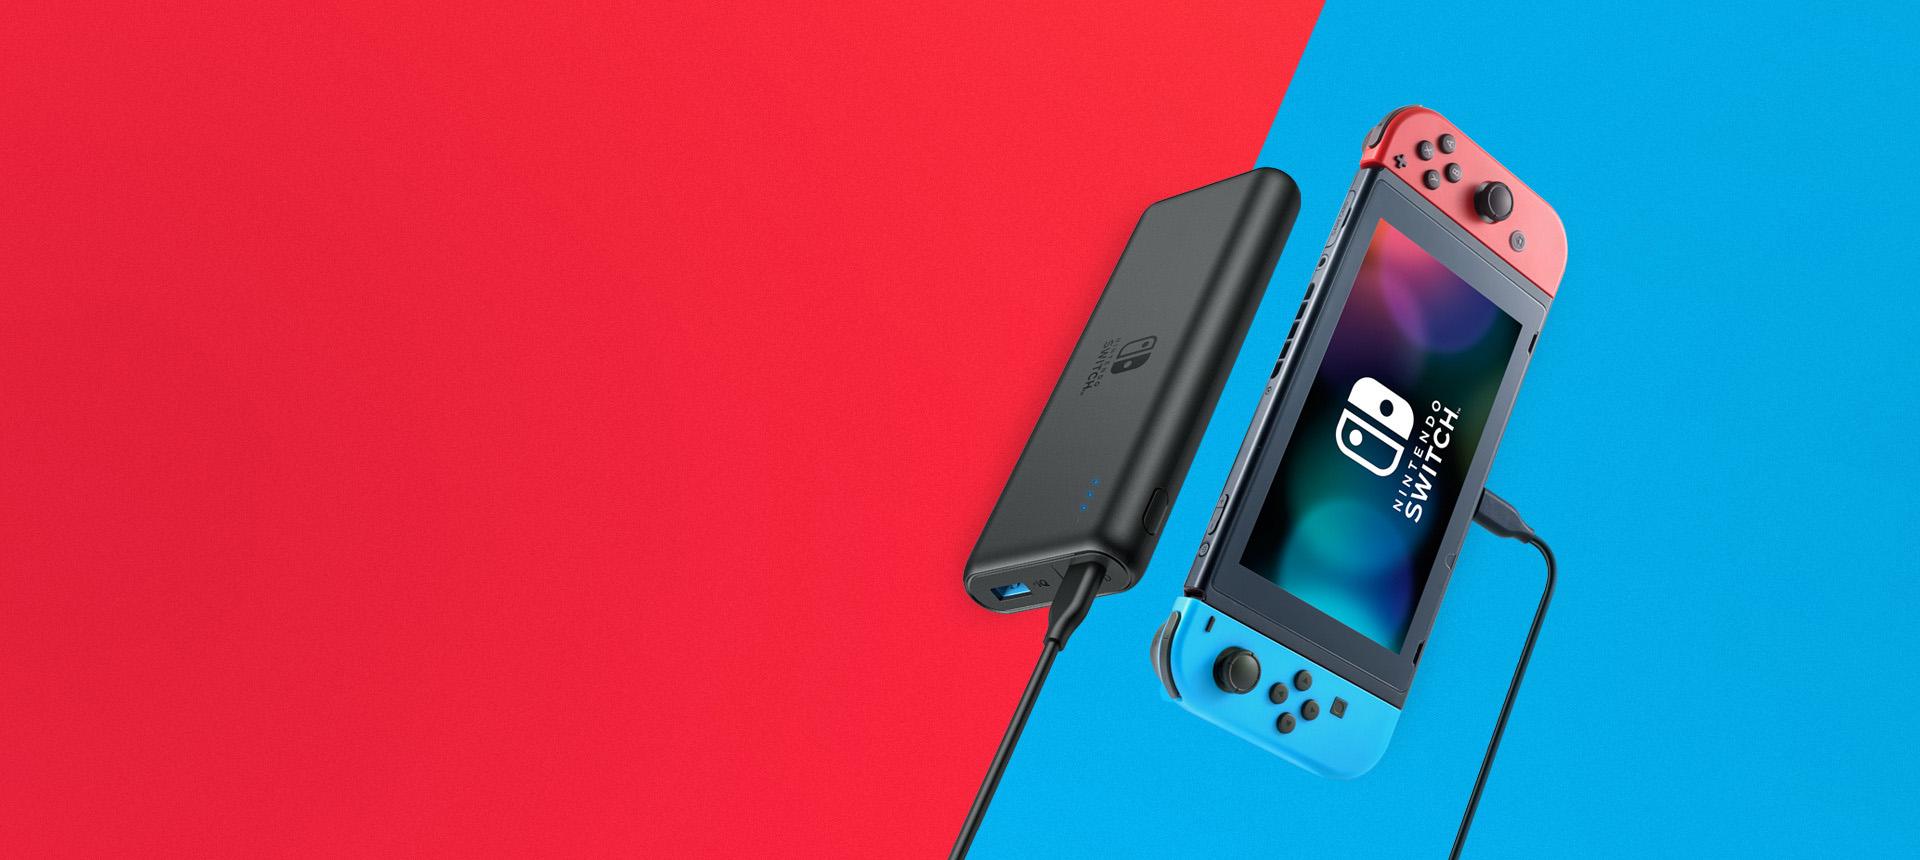 Details about Full Sets Switch NFC Tag Cards Zelda Splatton Amiibo Mario  Kart Odyssey Nintendo